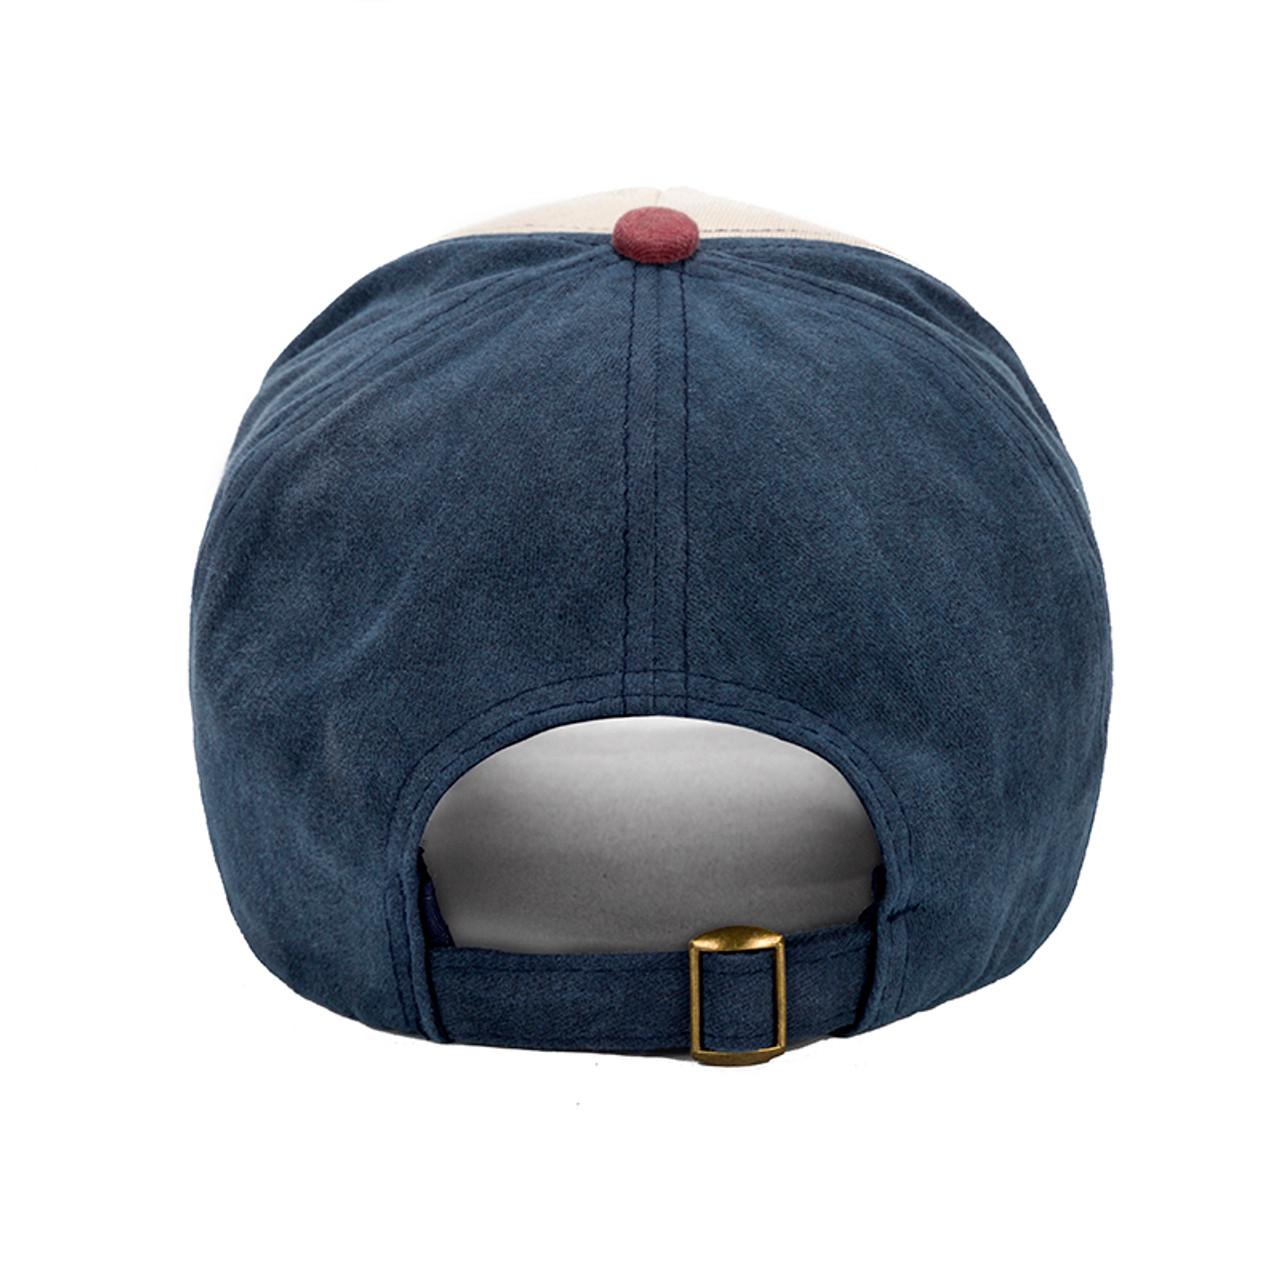 94f0ff33f87 ... ISummer 2018 Retro Baseball Cap Women Grinding Patchwor Baseball Hat  Men Snapback Hip Hop Hat Cotton ...